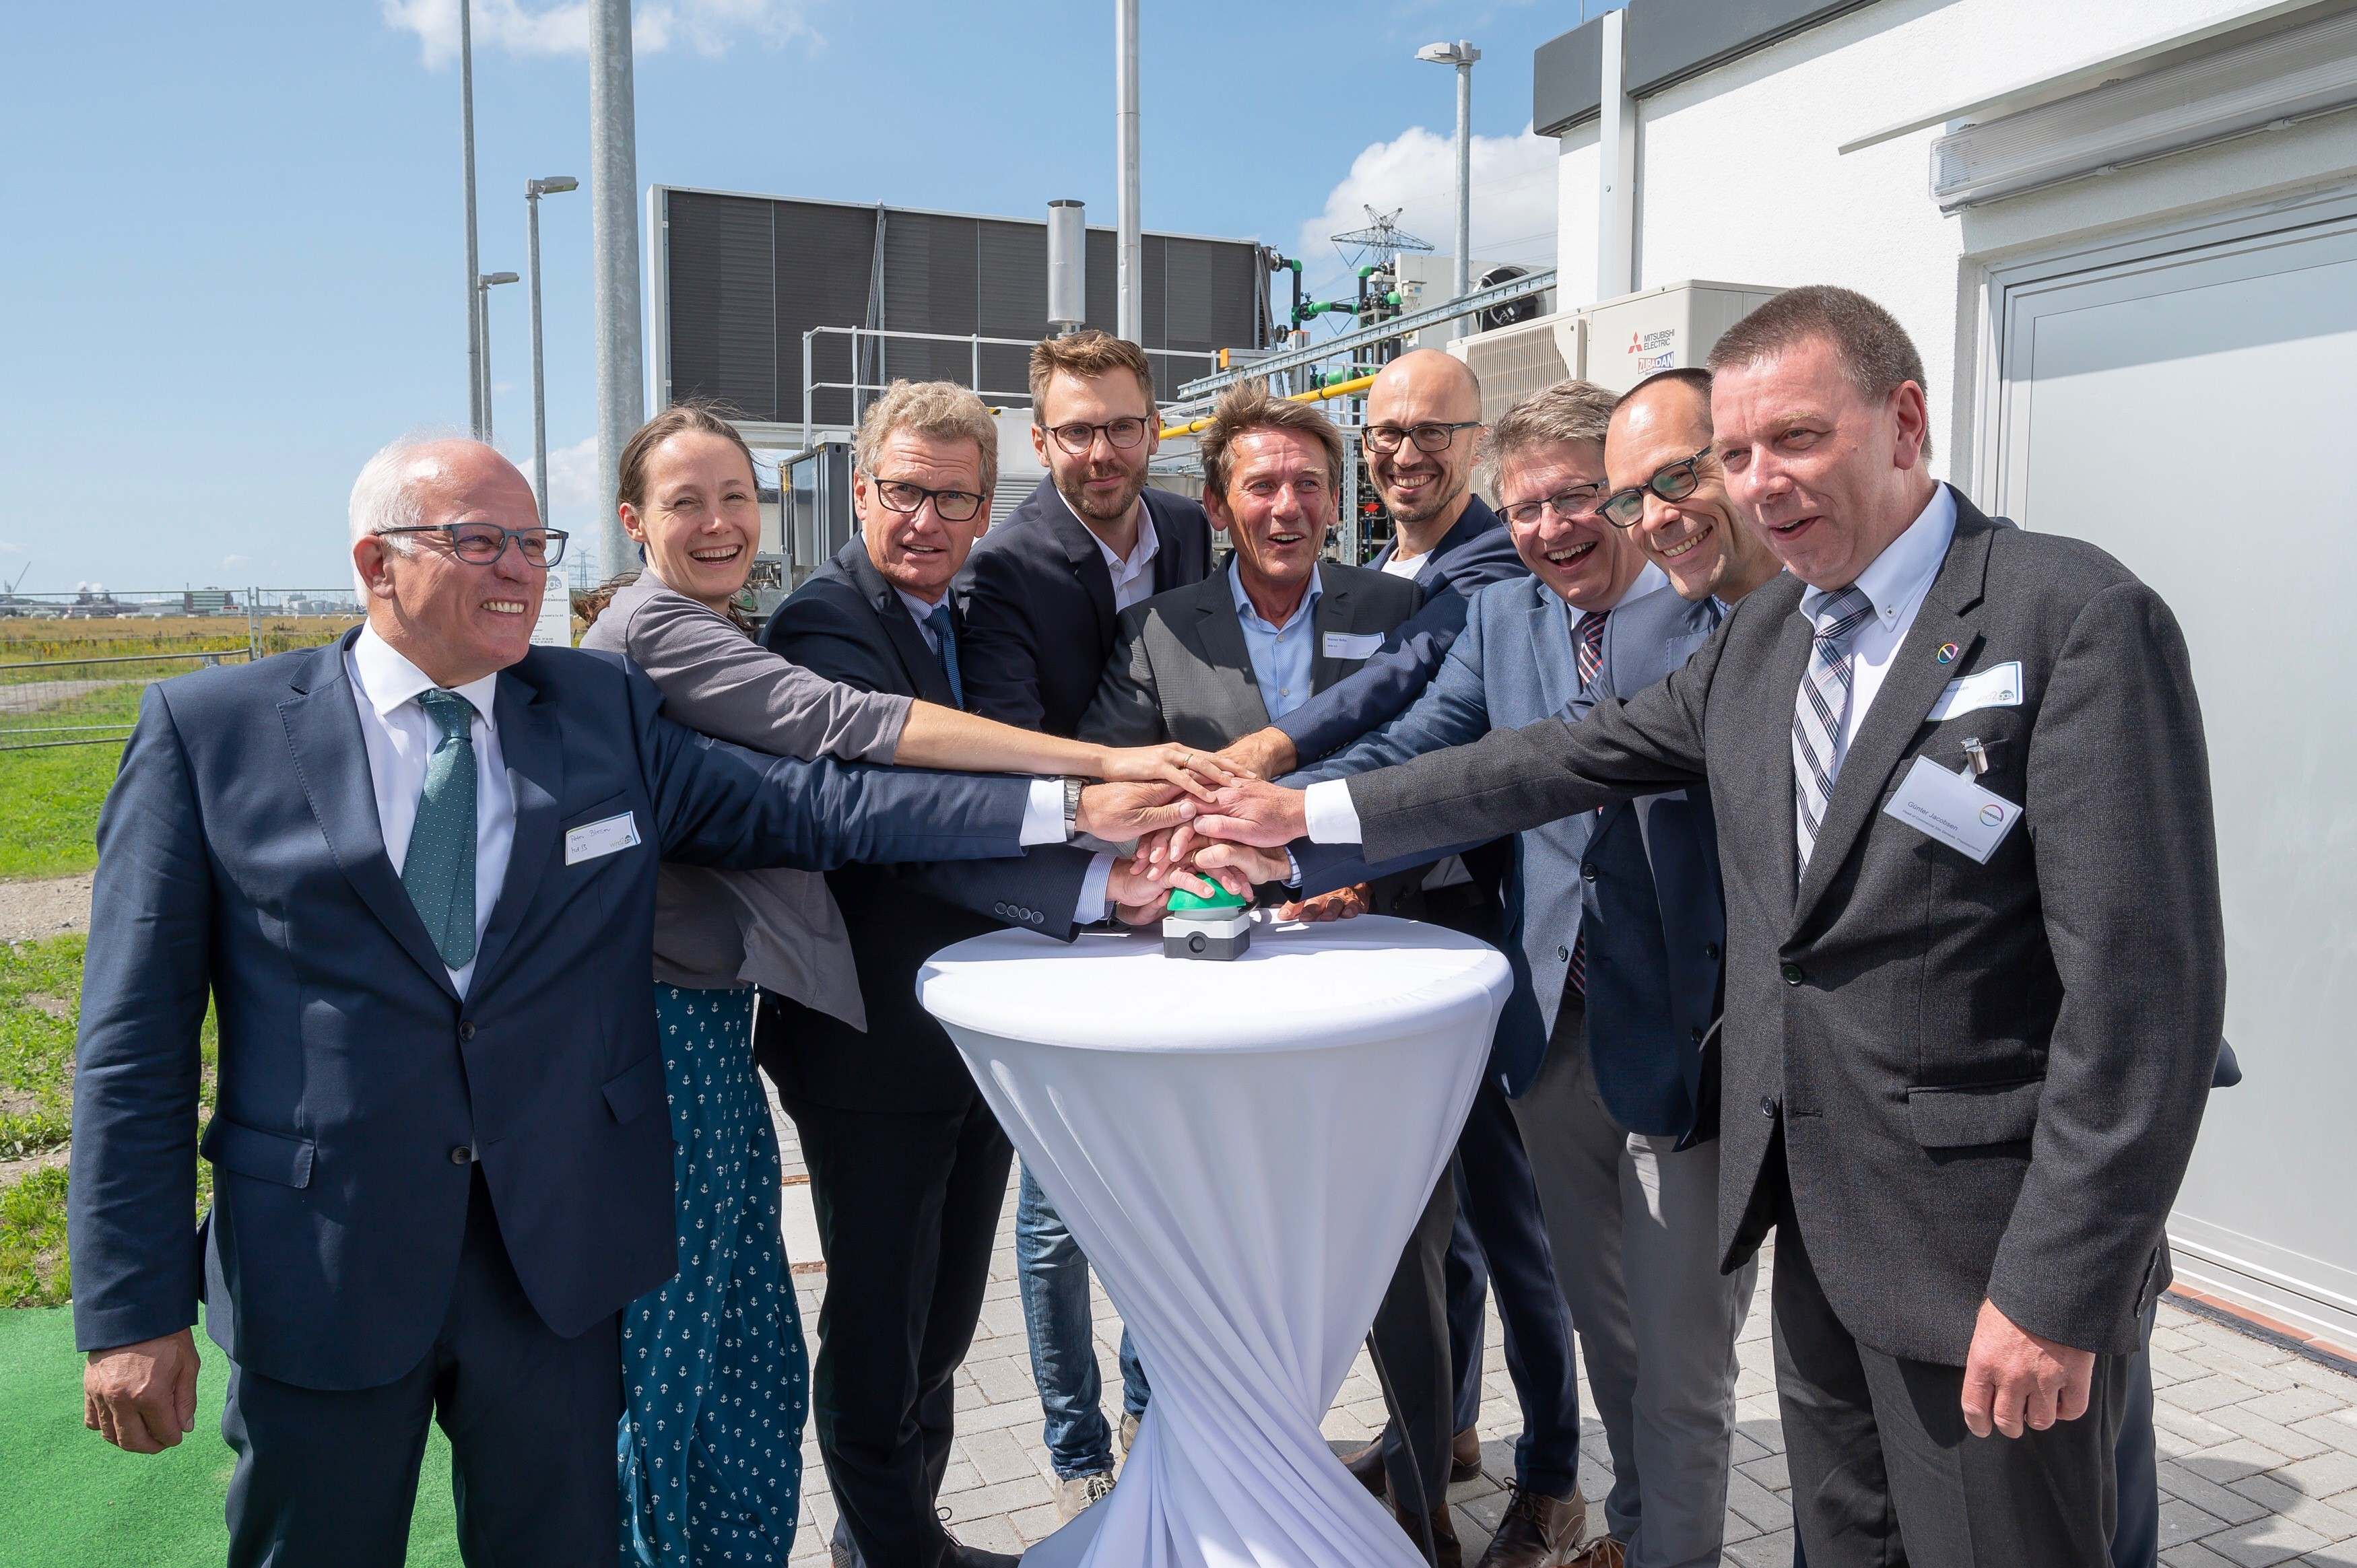 Brunsb%C3%BCttel Hydrogen Plant and Station Opened